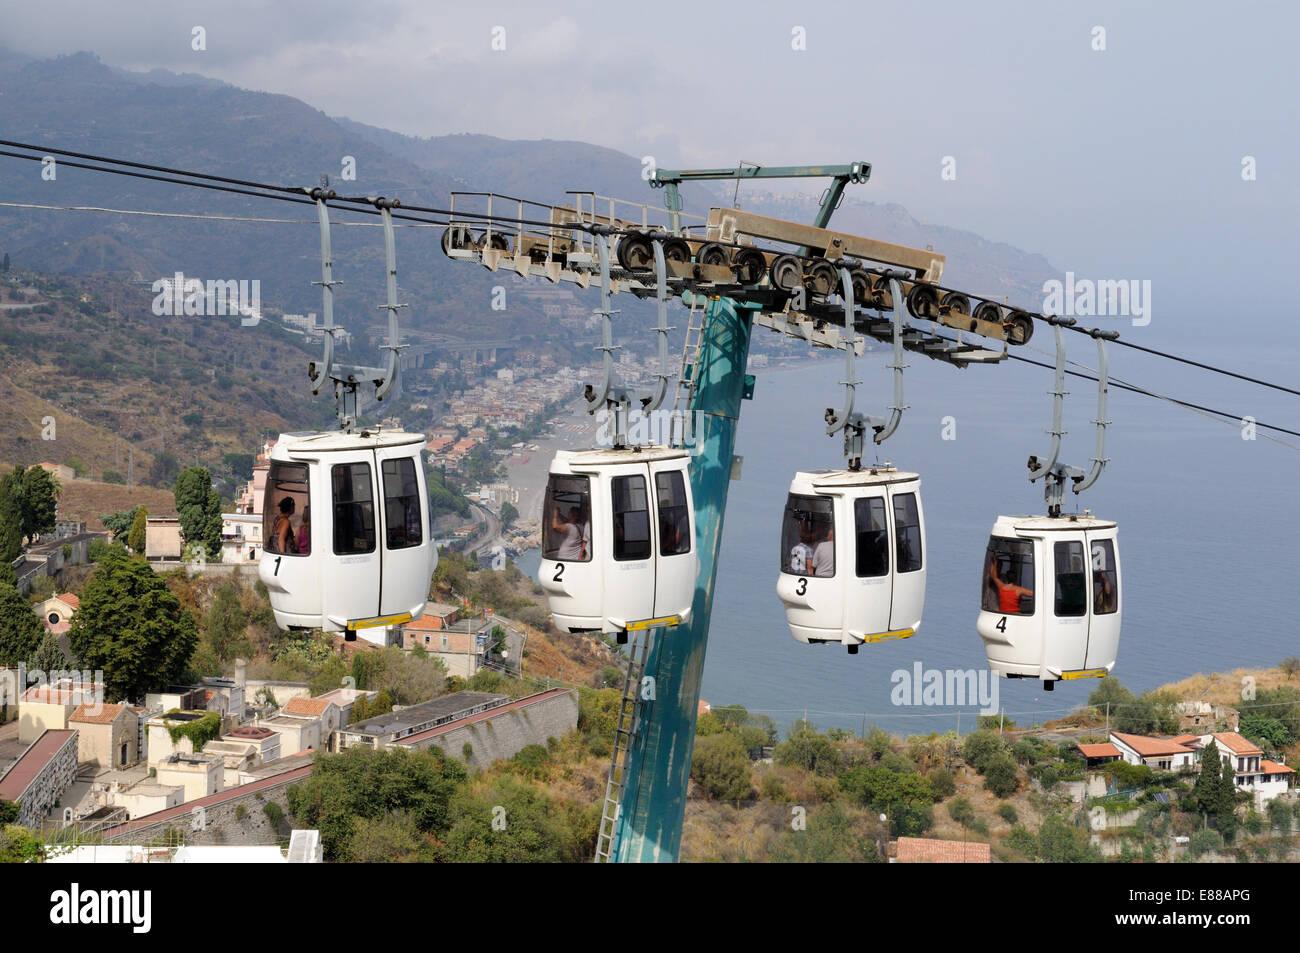 Arial Tramway between Taormina and the beaches at Mazzaro Sicily Italy - Stock Image